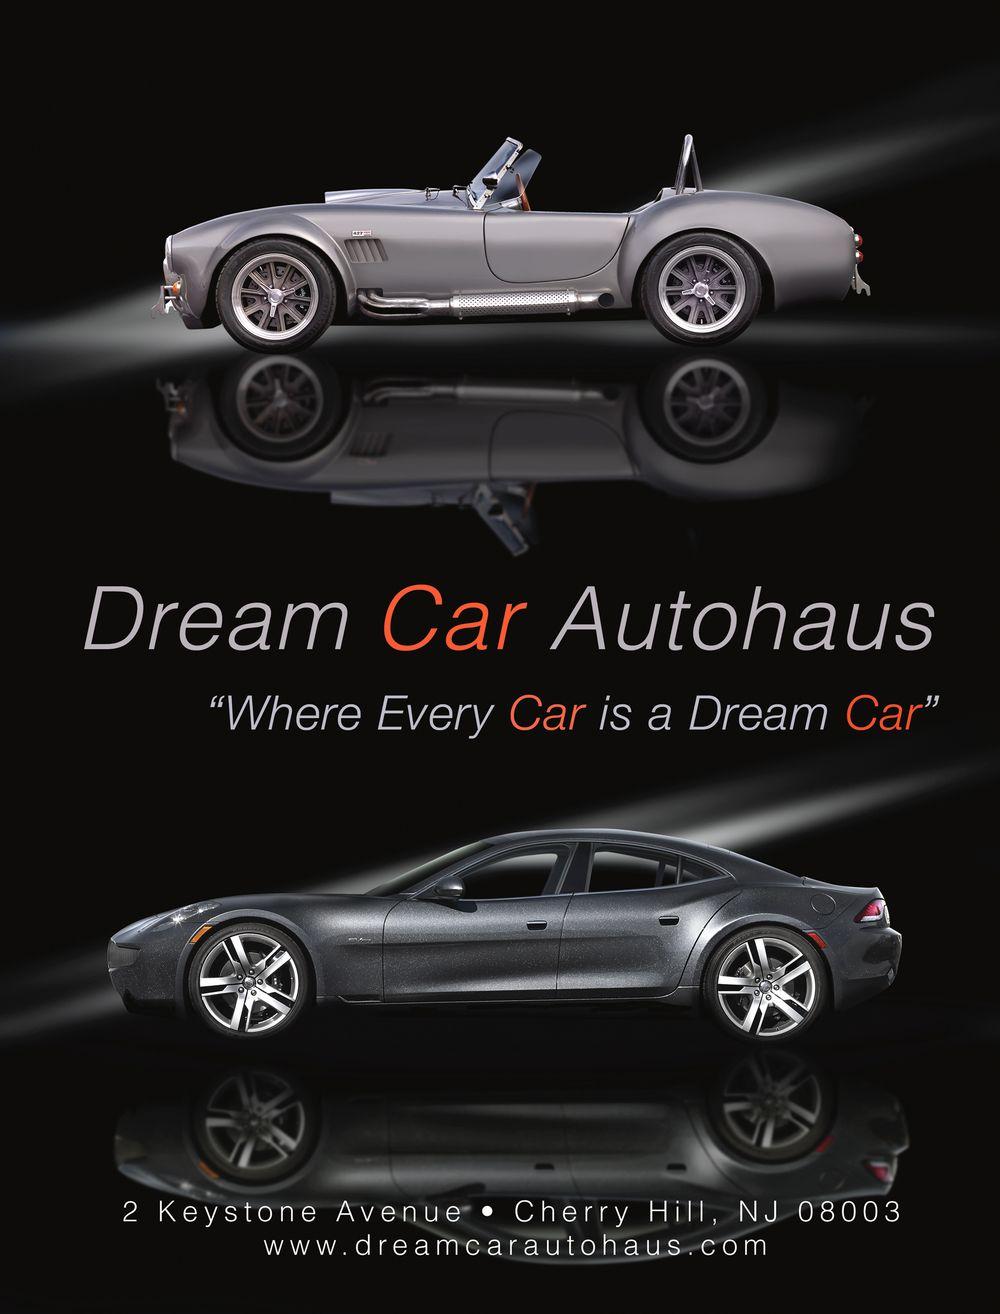 DreamCarAutohaus_rev01web.jpg